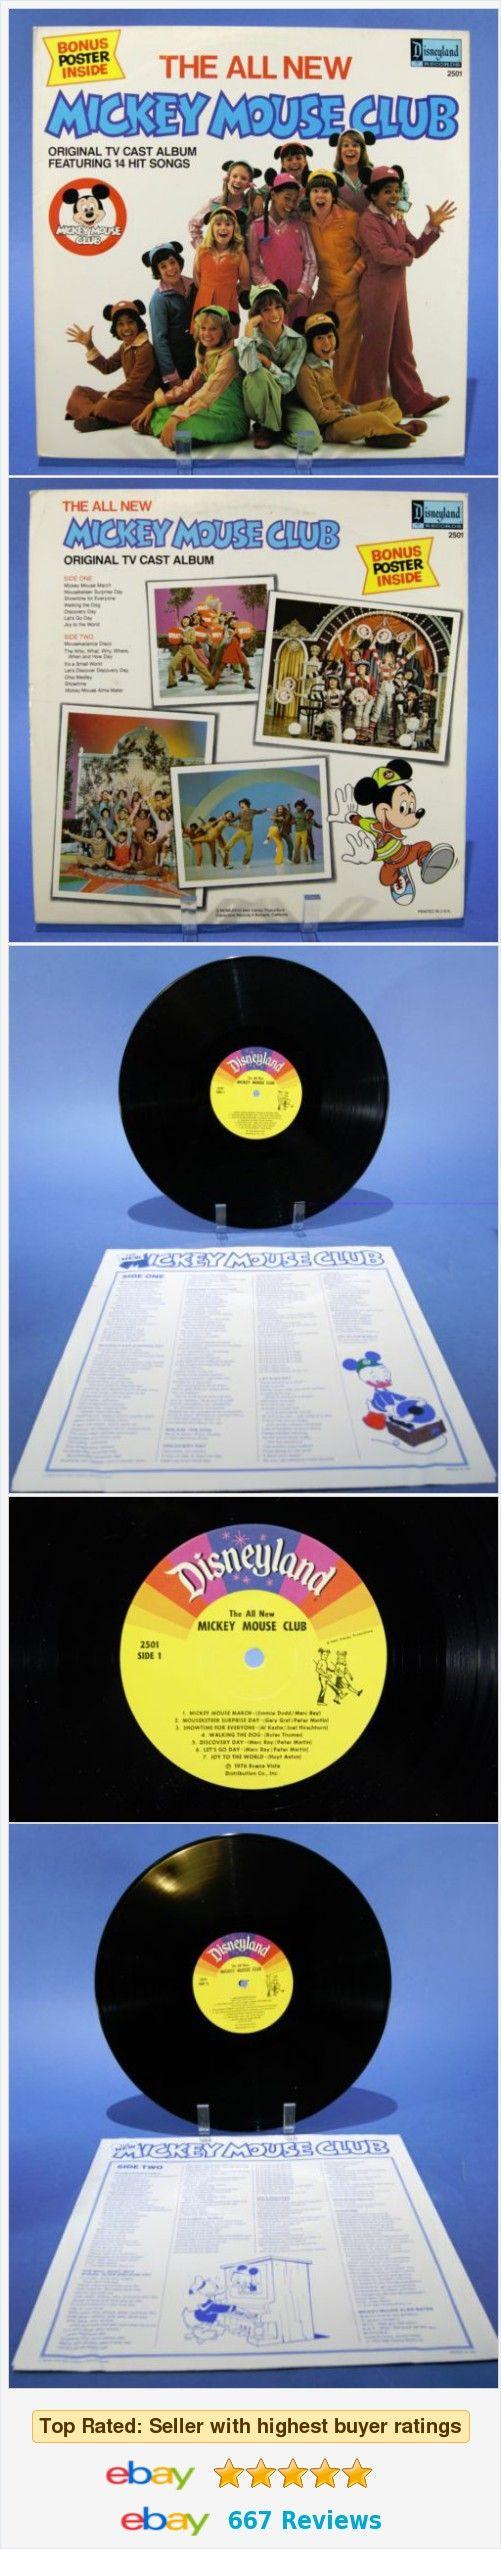 All New Mickey Mouse Club Vinyl Record Album LP Vintage Disneyland Records 1976    eBay